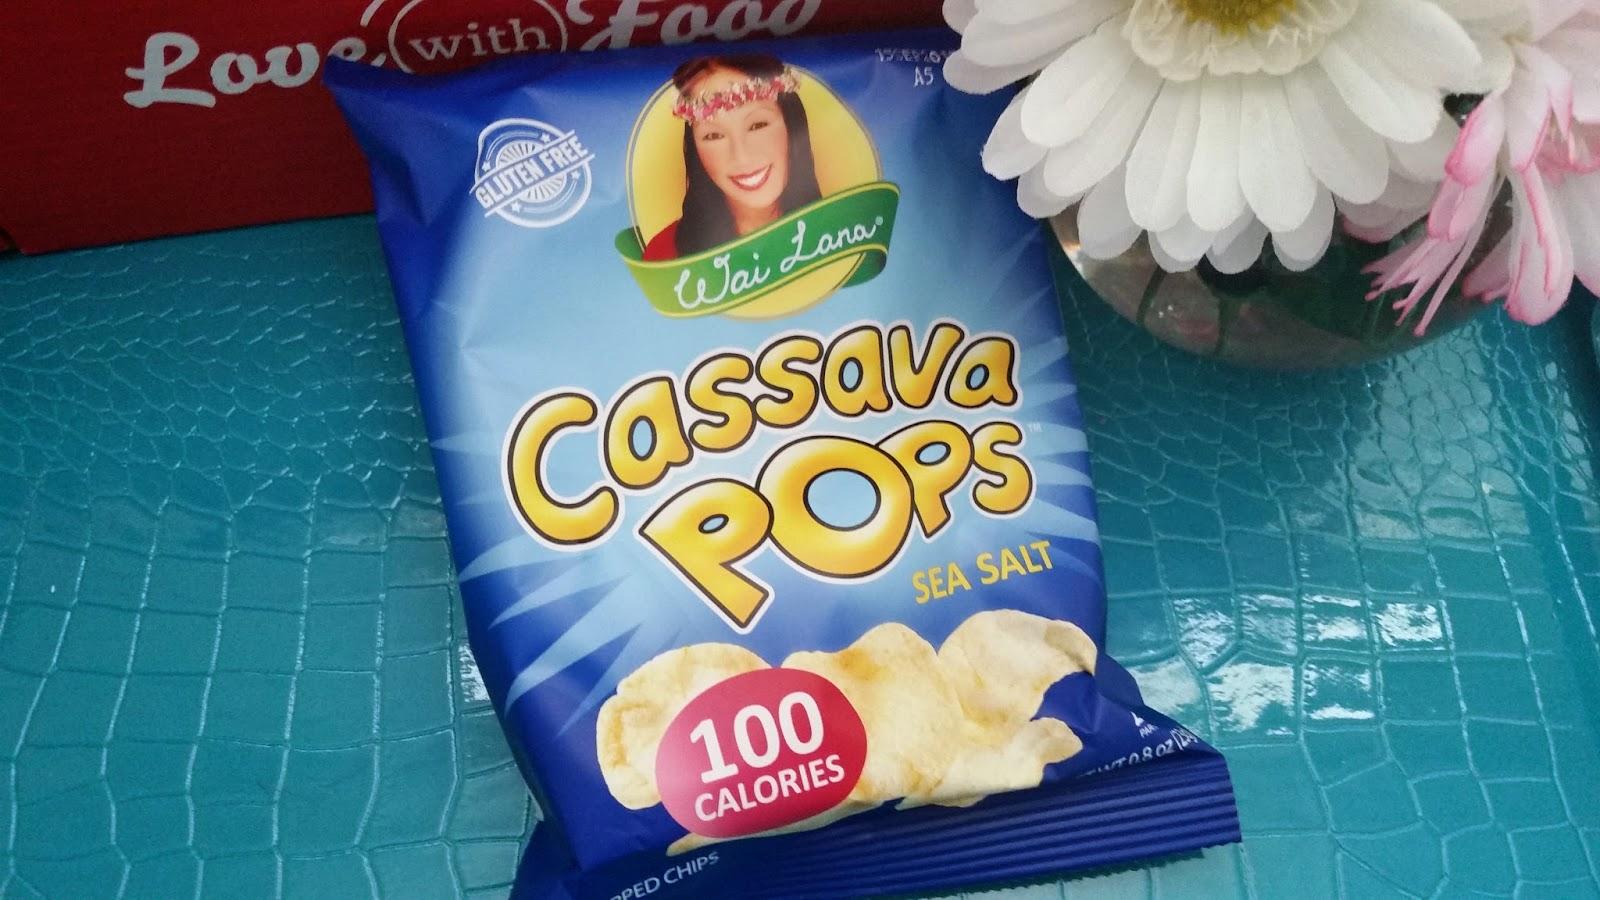 Wai Lana Cassava Pops